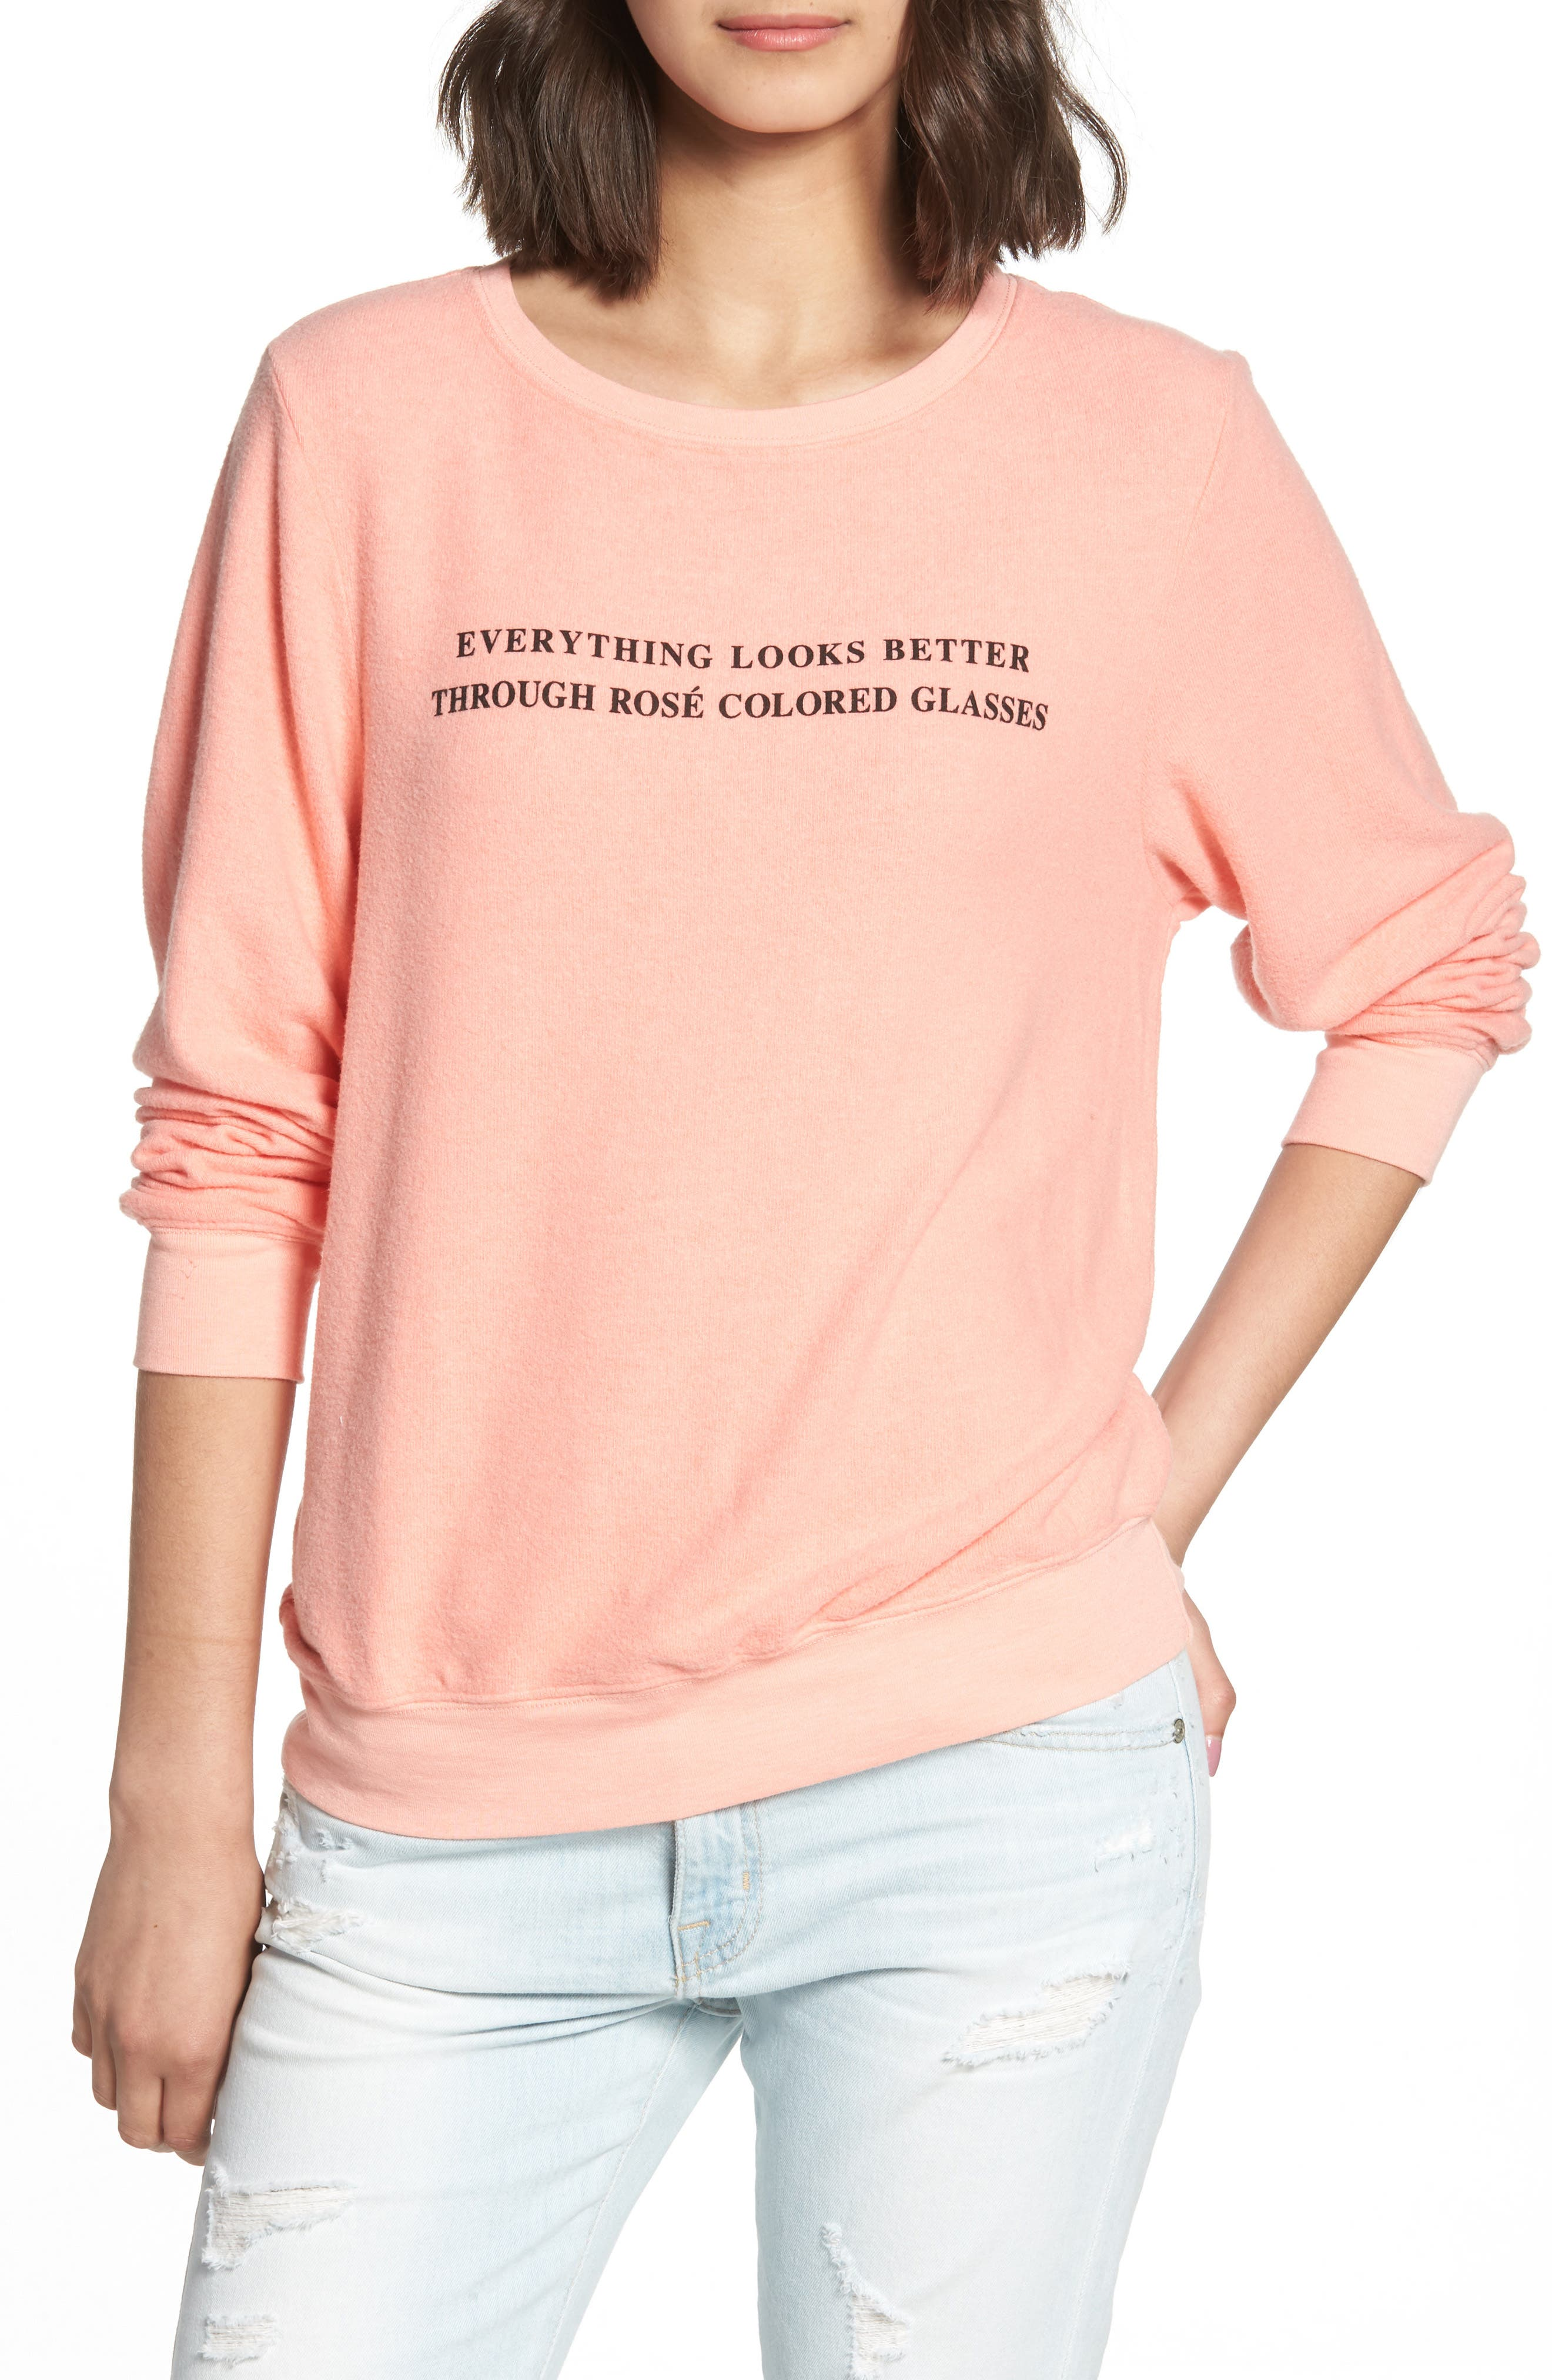 Rosé Glasses Beach Sweatshirt,                             Main thumbnail 1, color,                             Coral